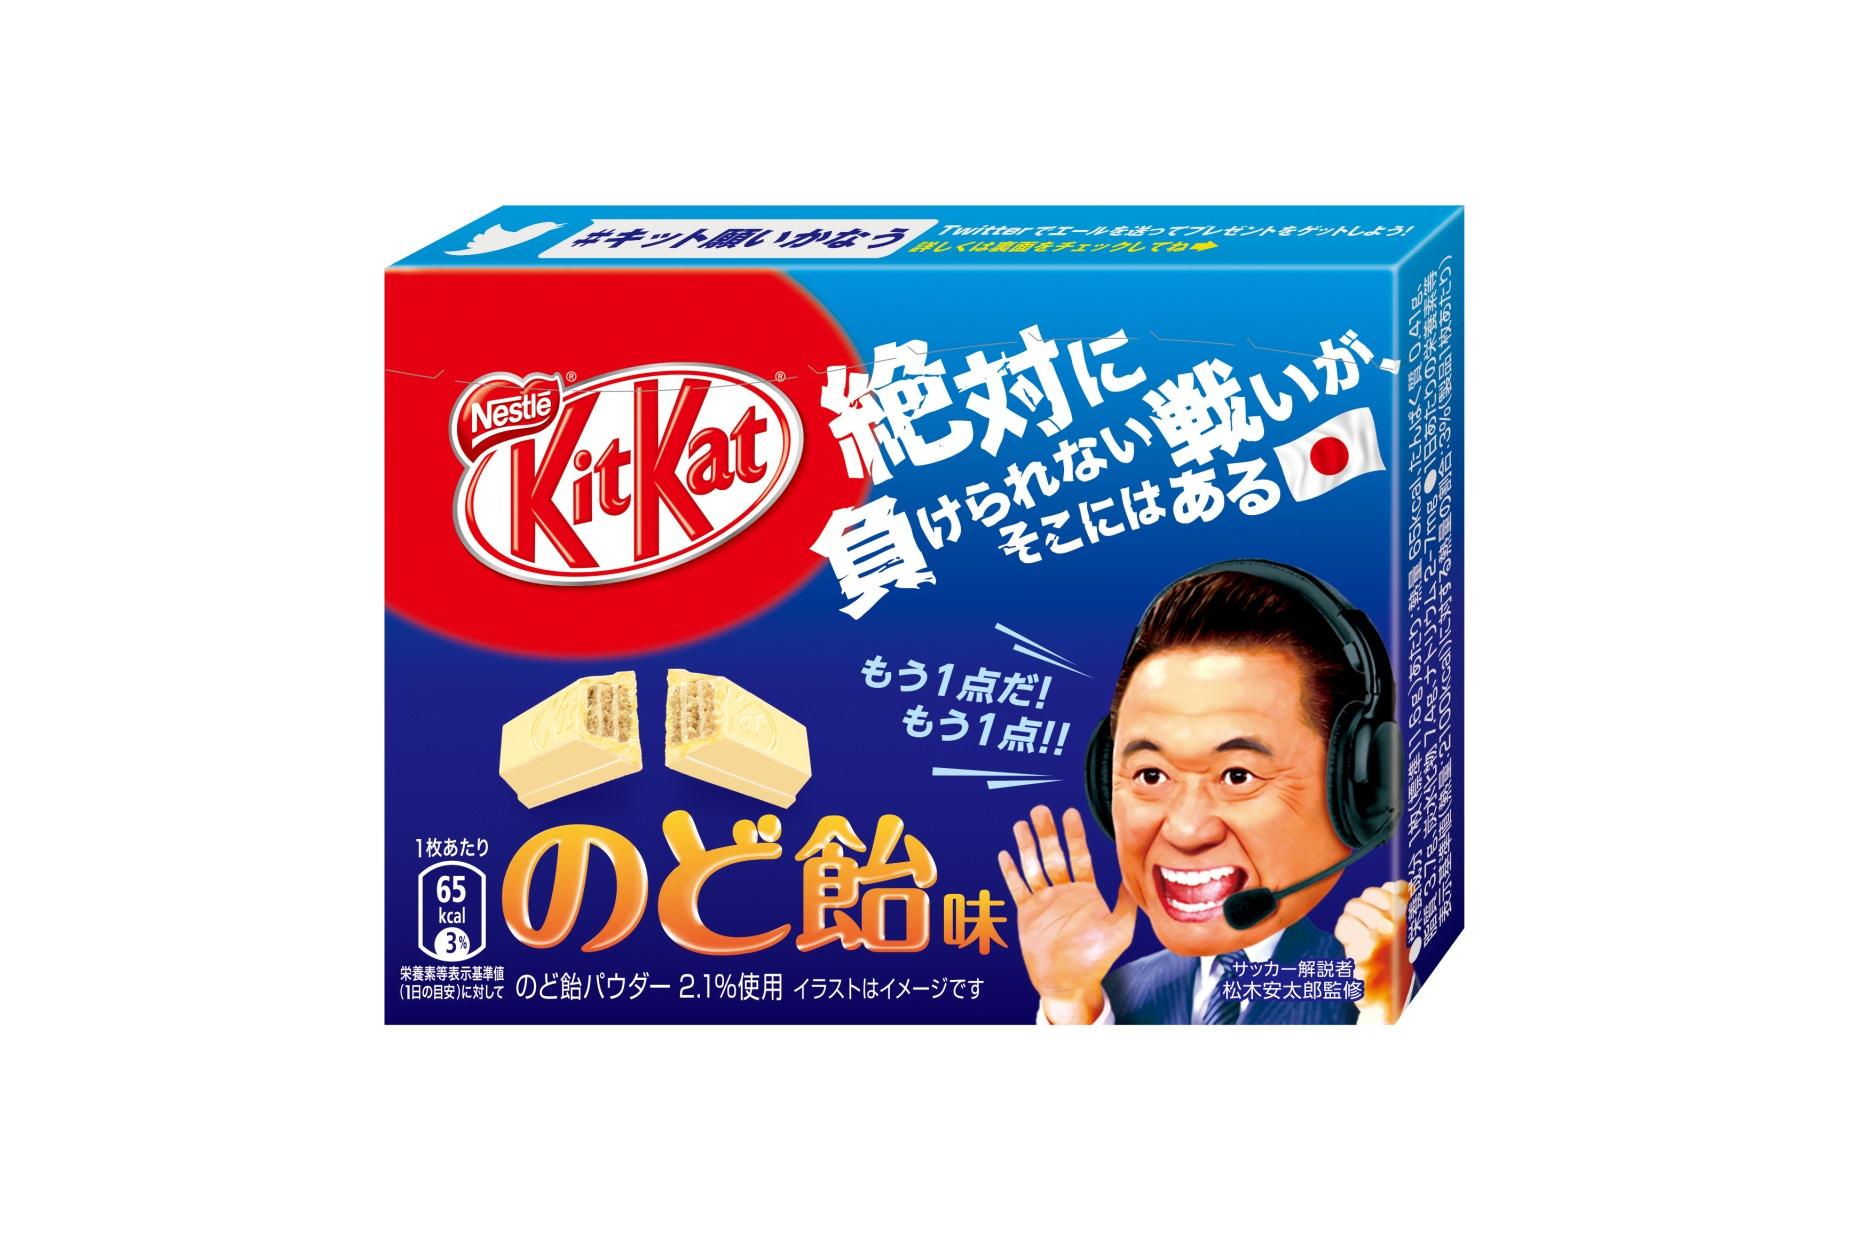 cough-drop-flavored-kitkats-japan-01